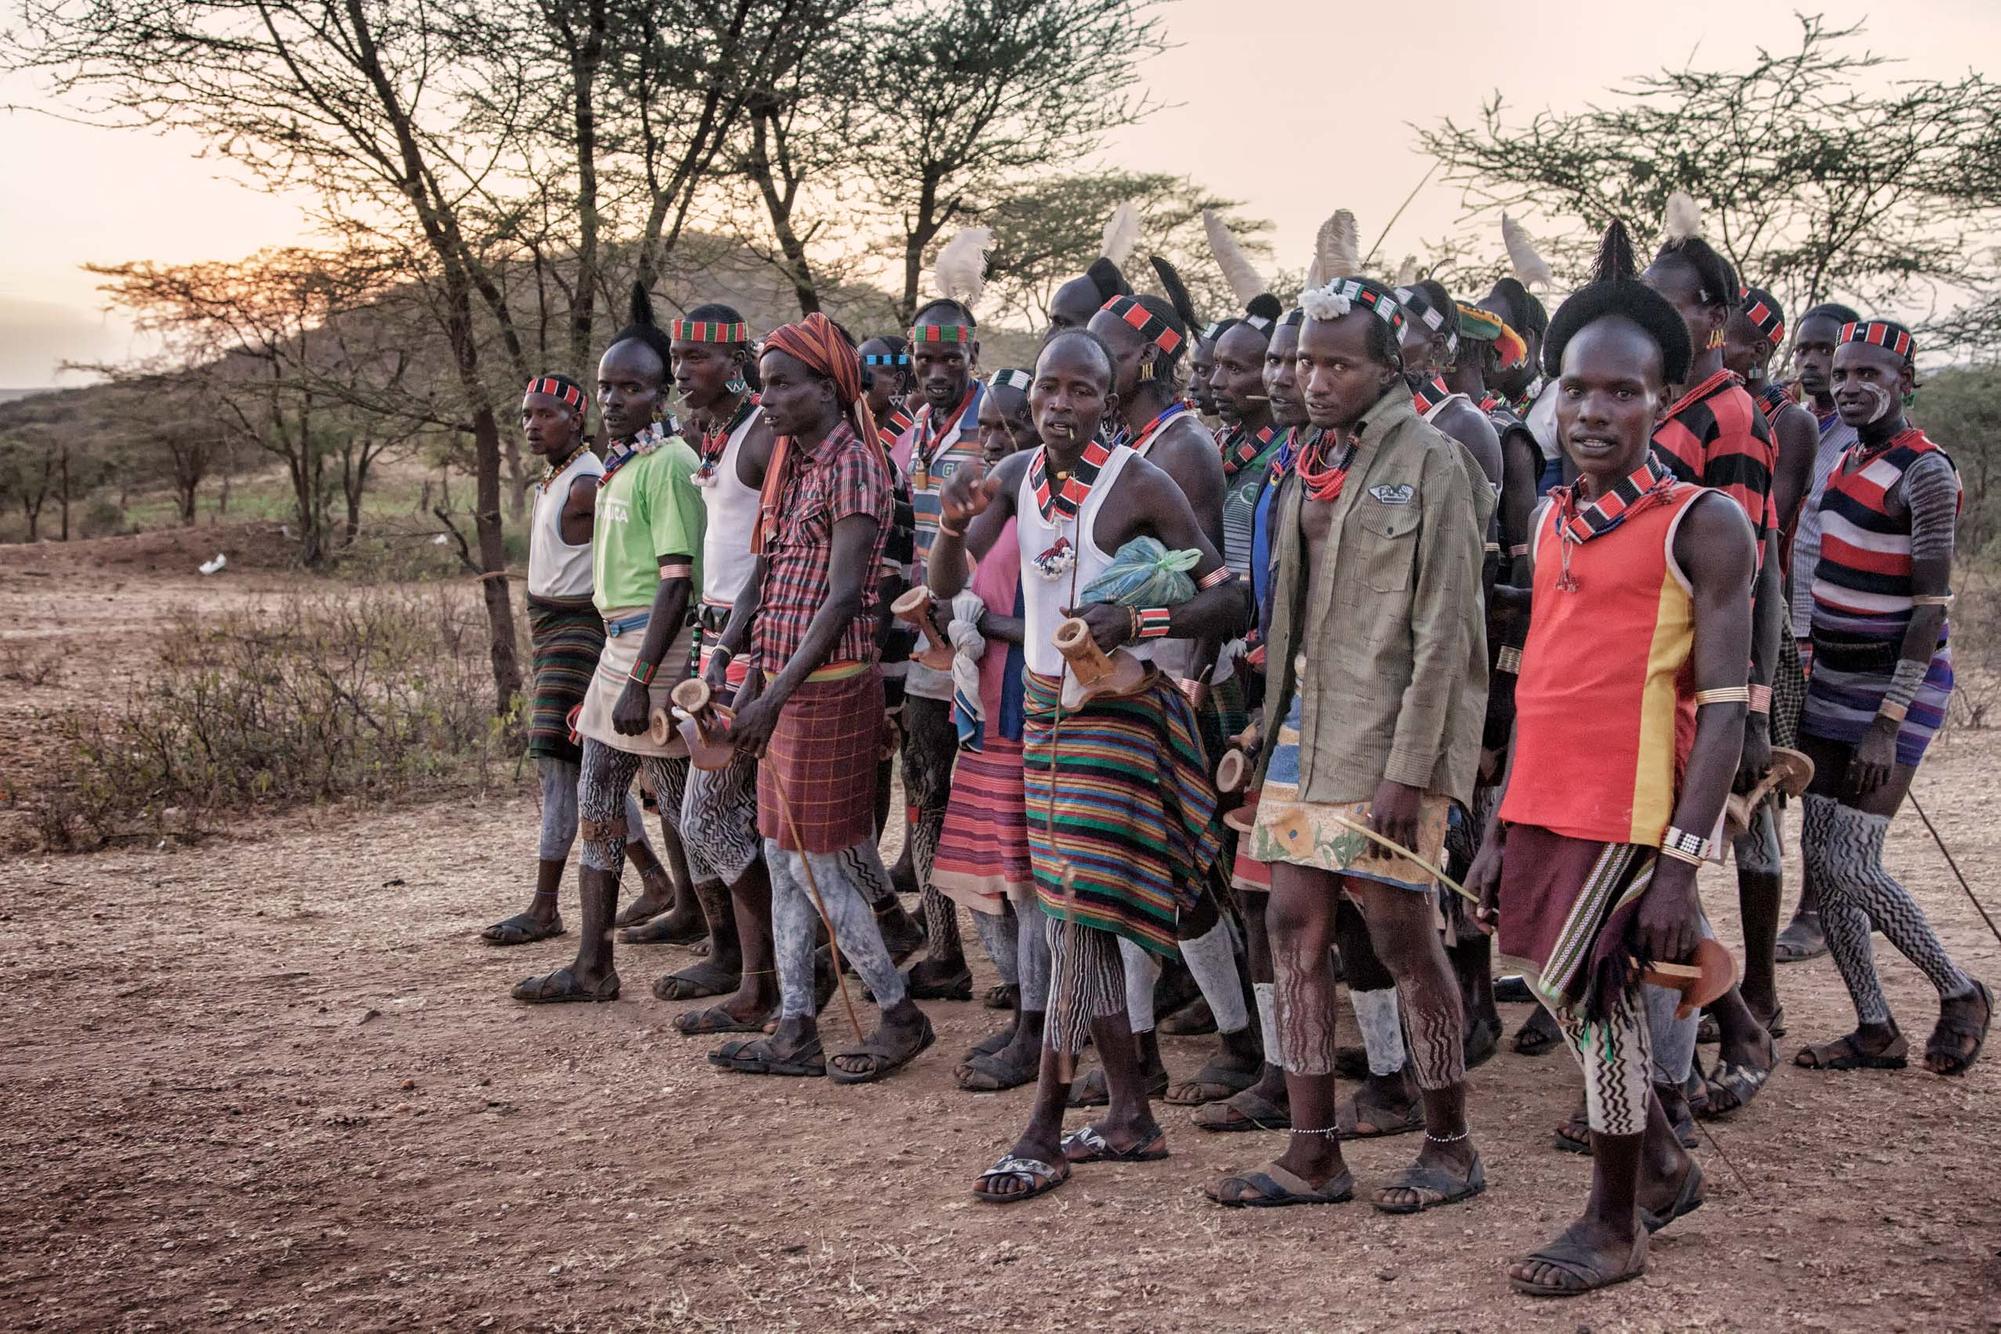 ETHIOPIA:  Among the Hamer